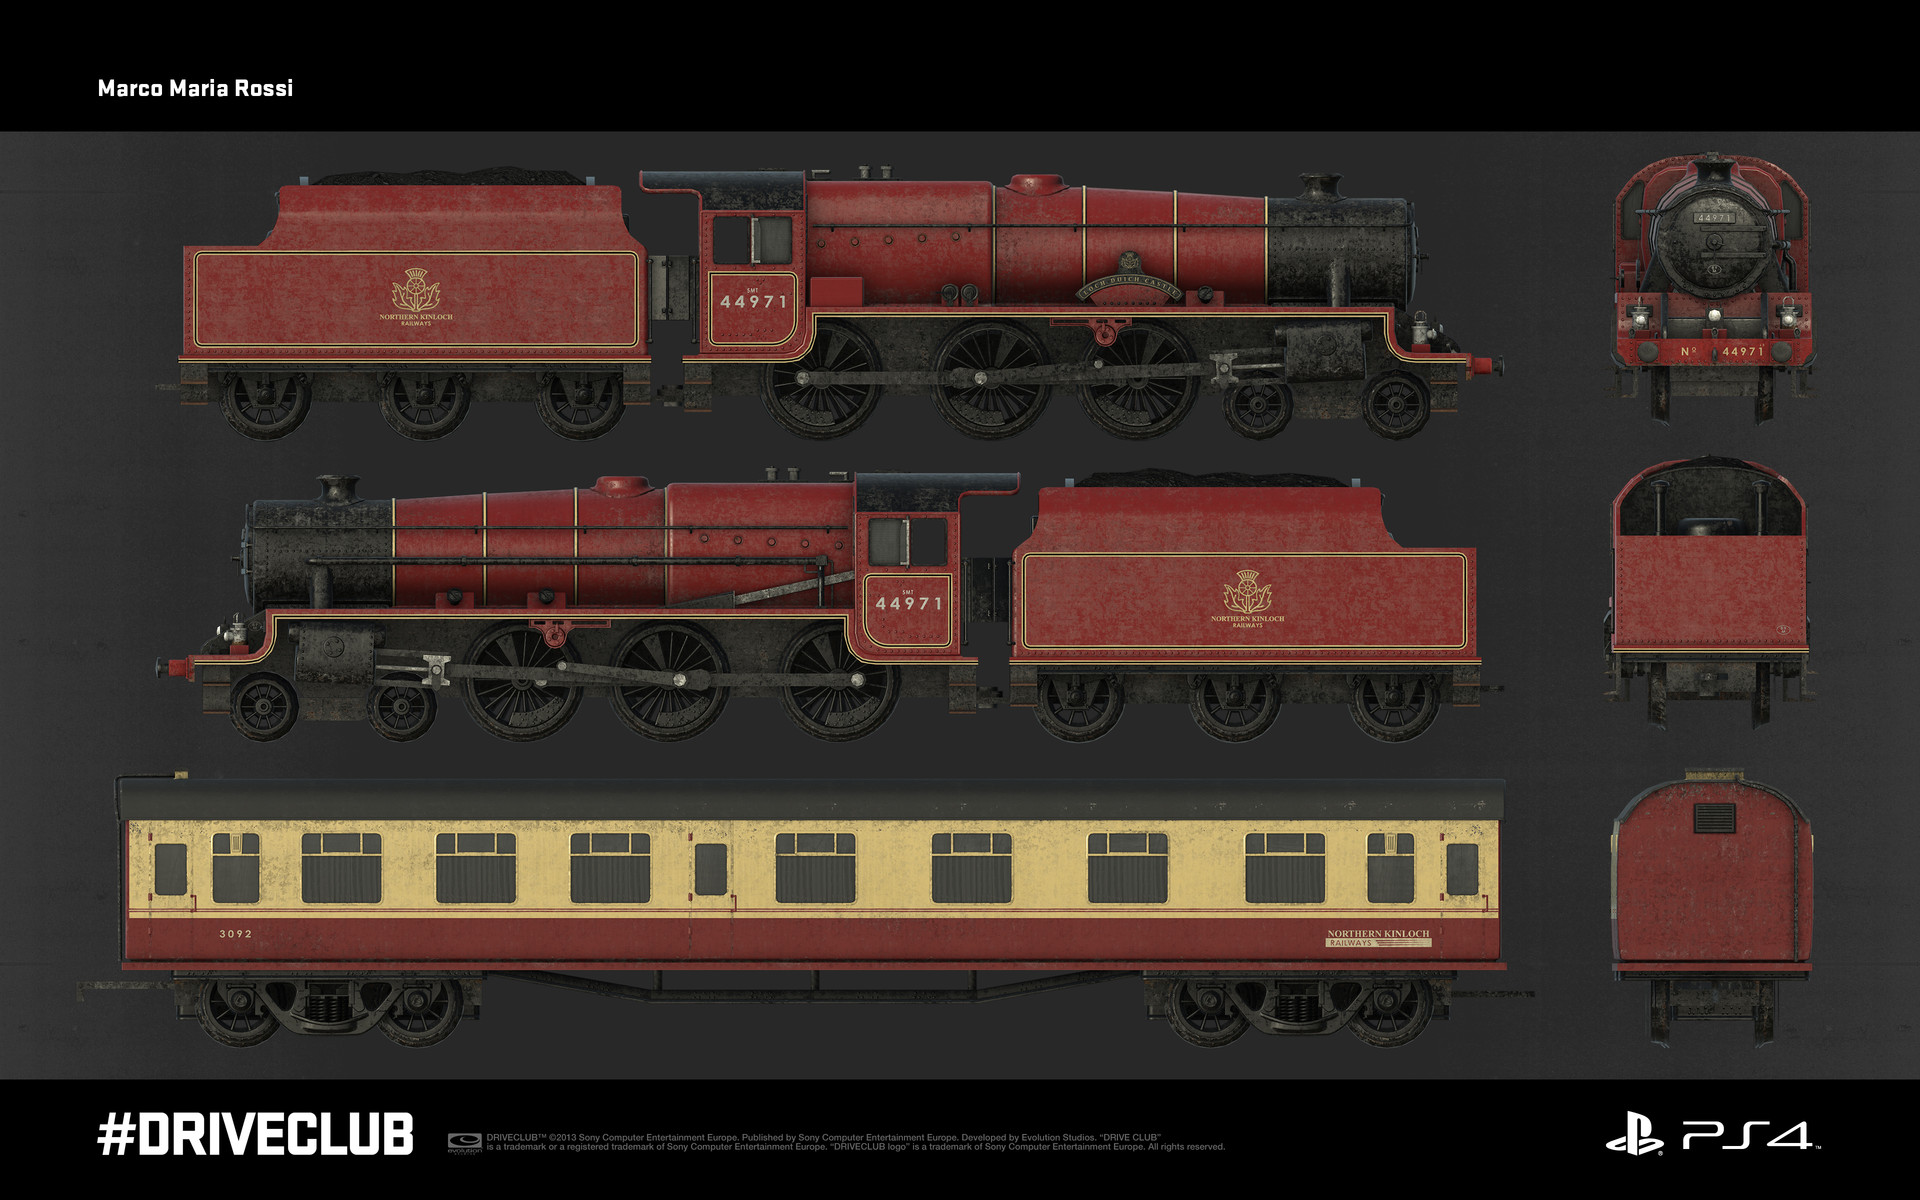 Marco maria rossi 003 2 train render